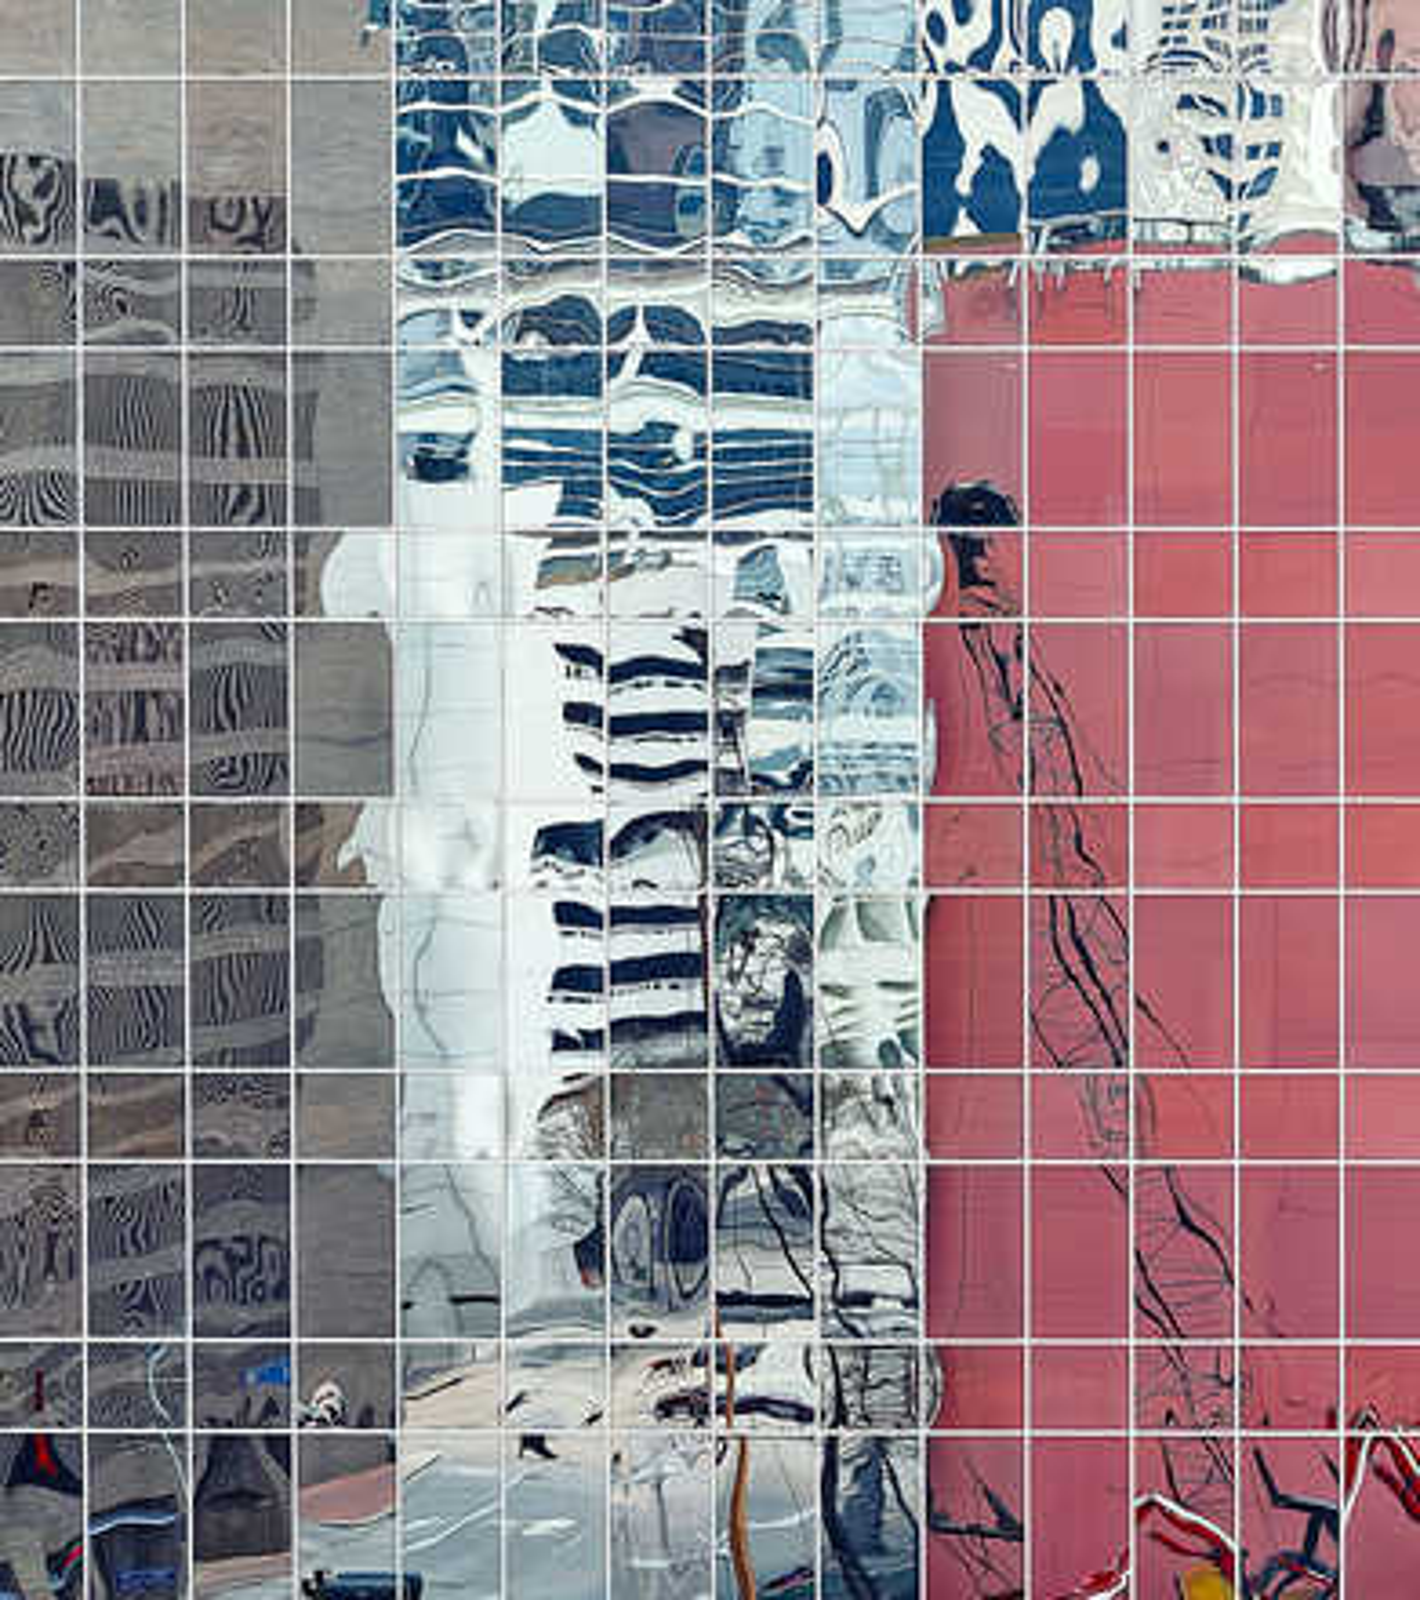 Triptych, Houston, TX - Andrea B. Stone